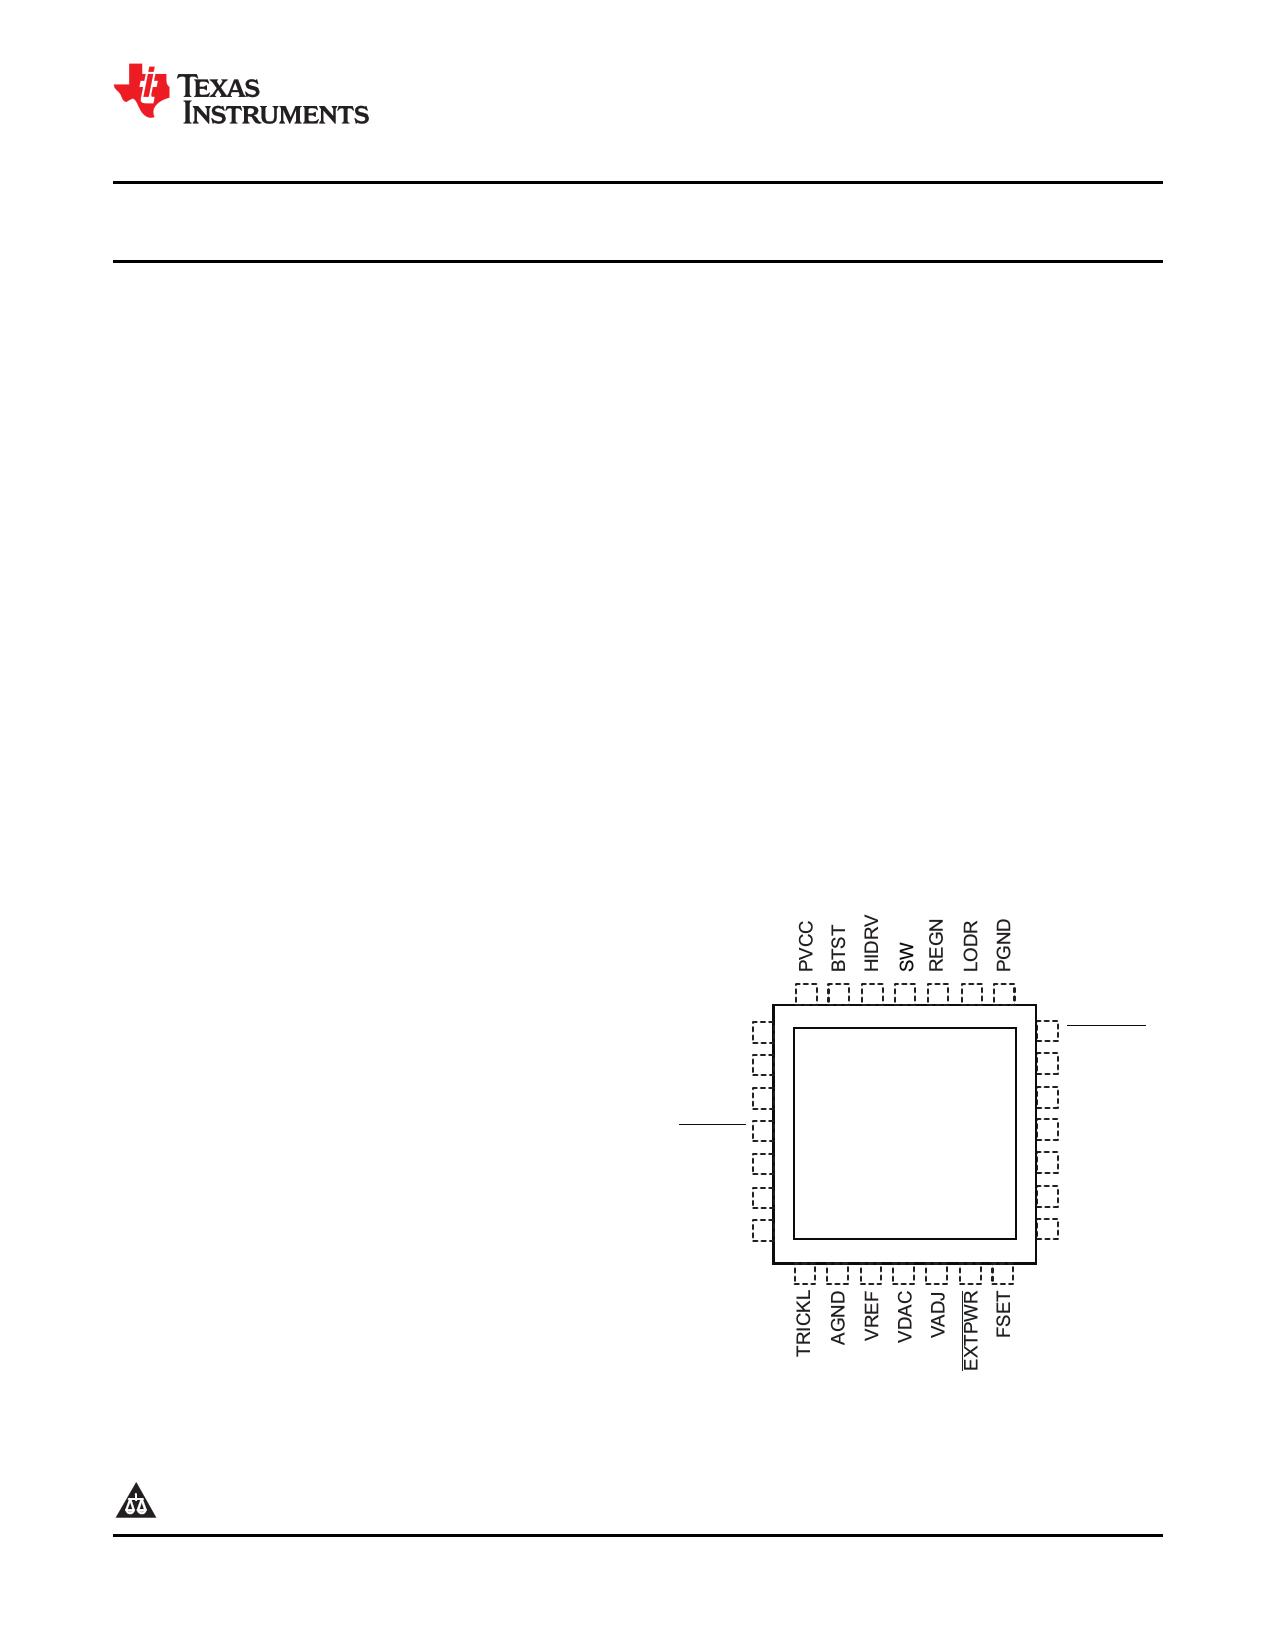 bq24741 Datasheet, bq24741 PDF,ピン配置, 機能